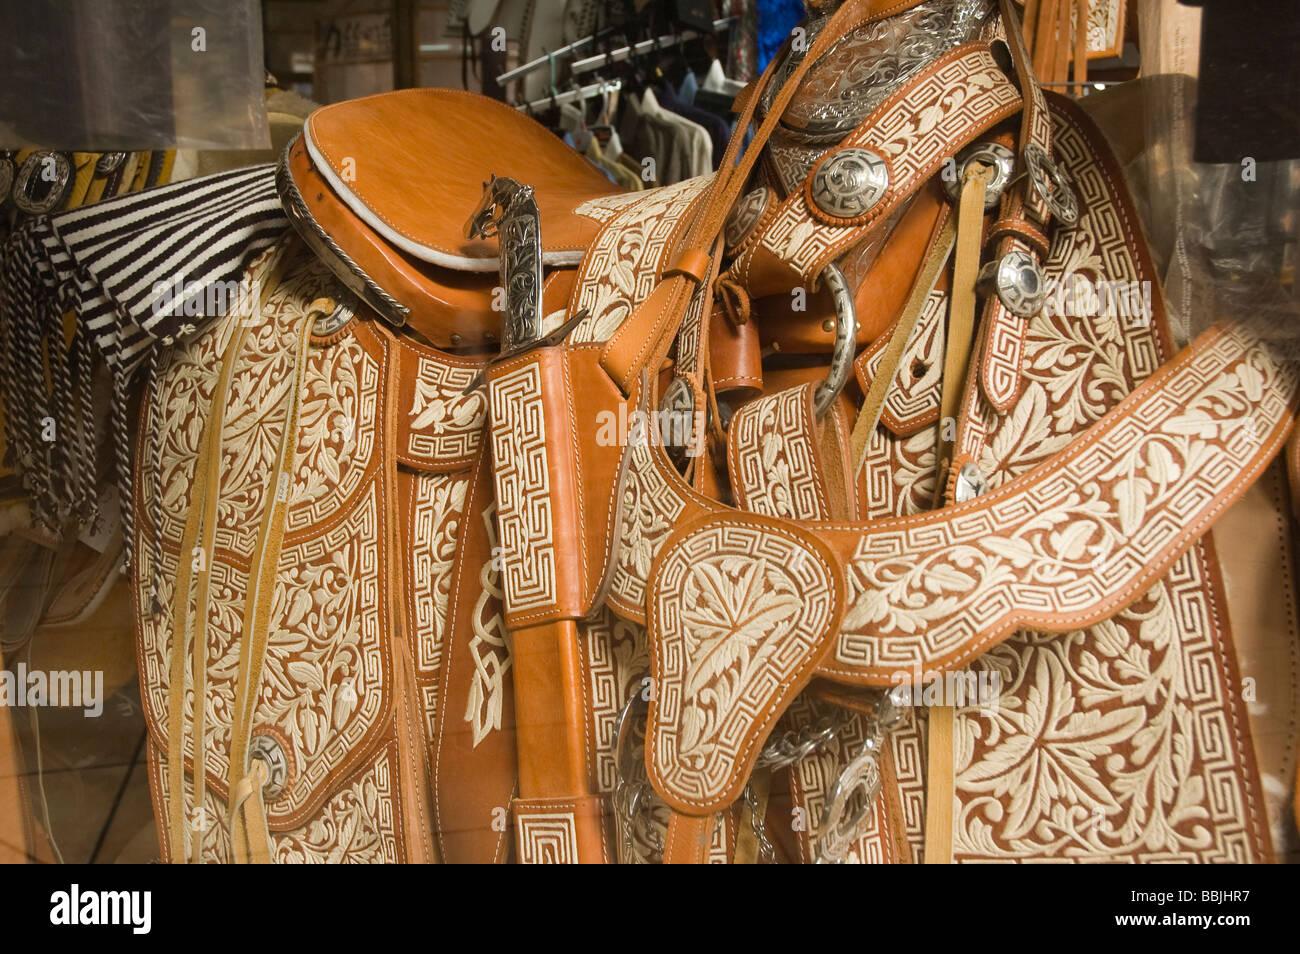 Elk187 1147 Mexico Zacatecas city tooled leather saddle - Stock Image